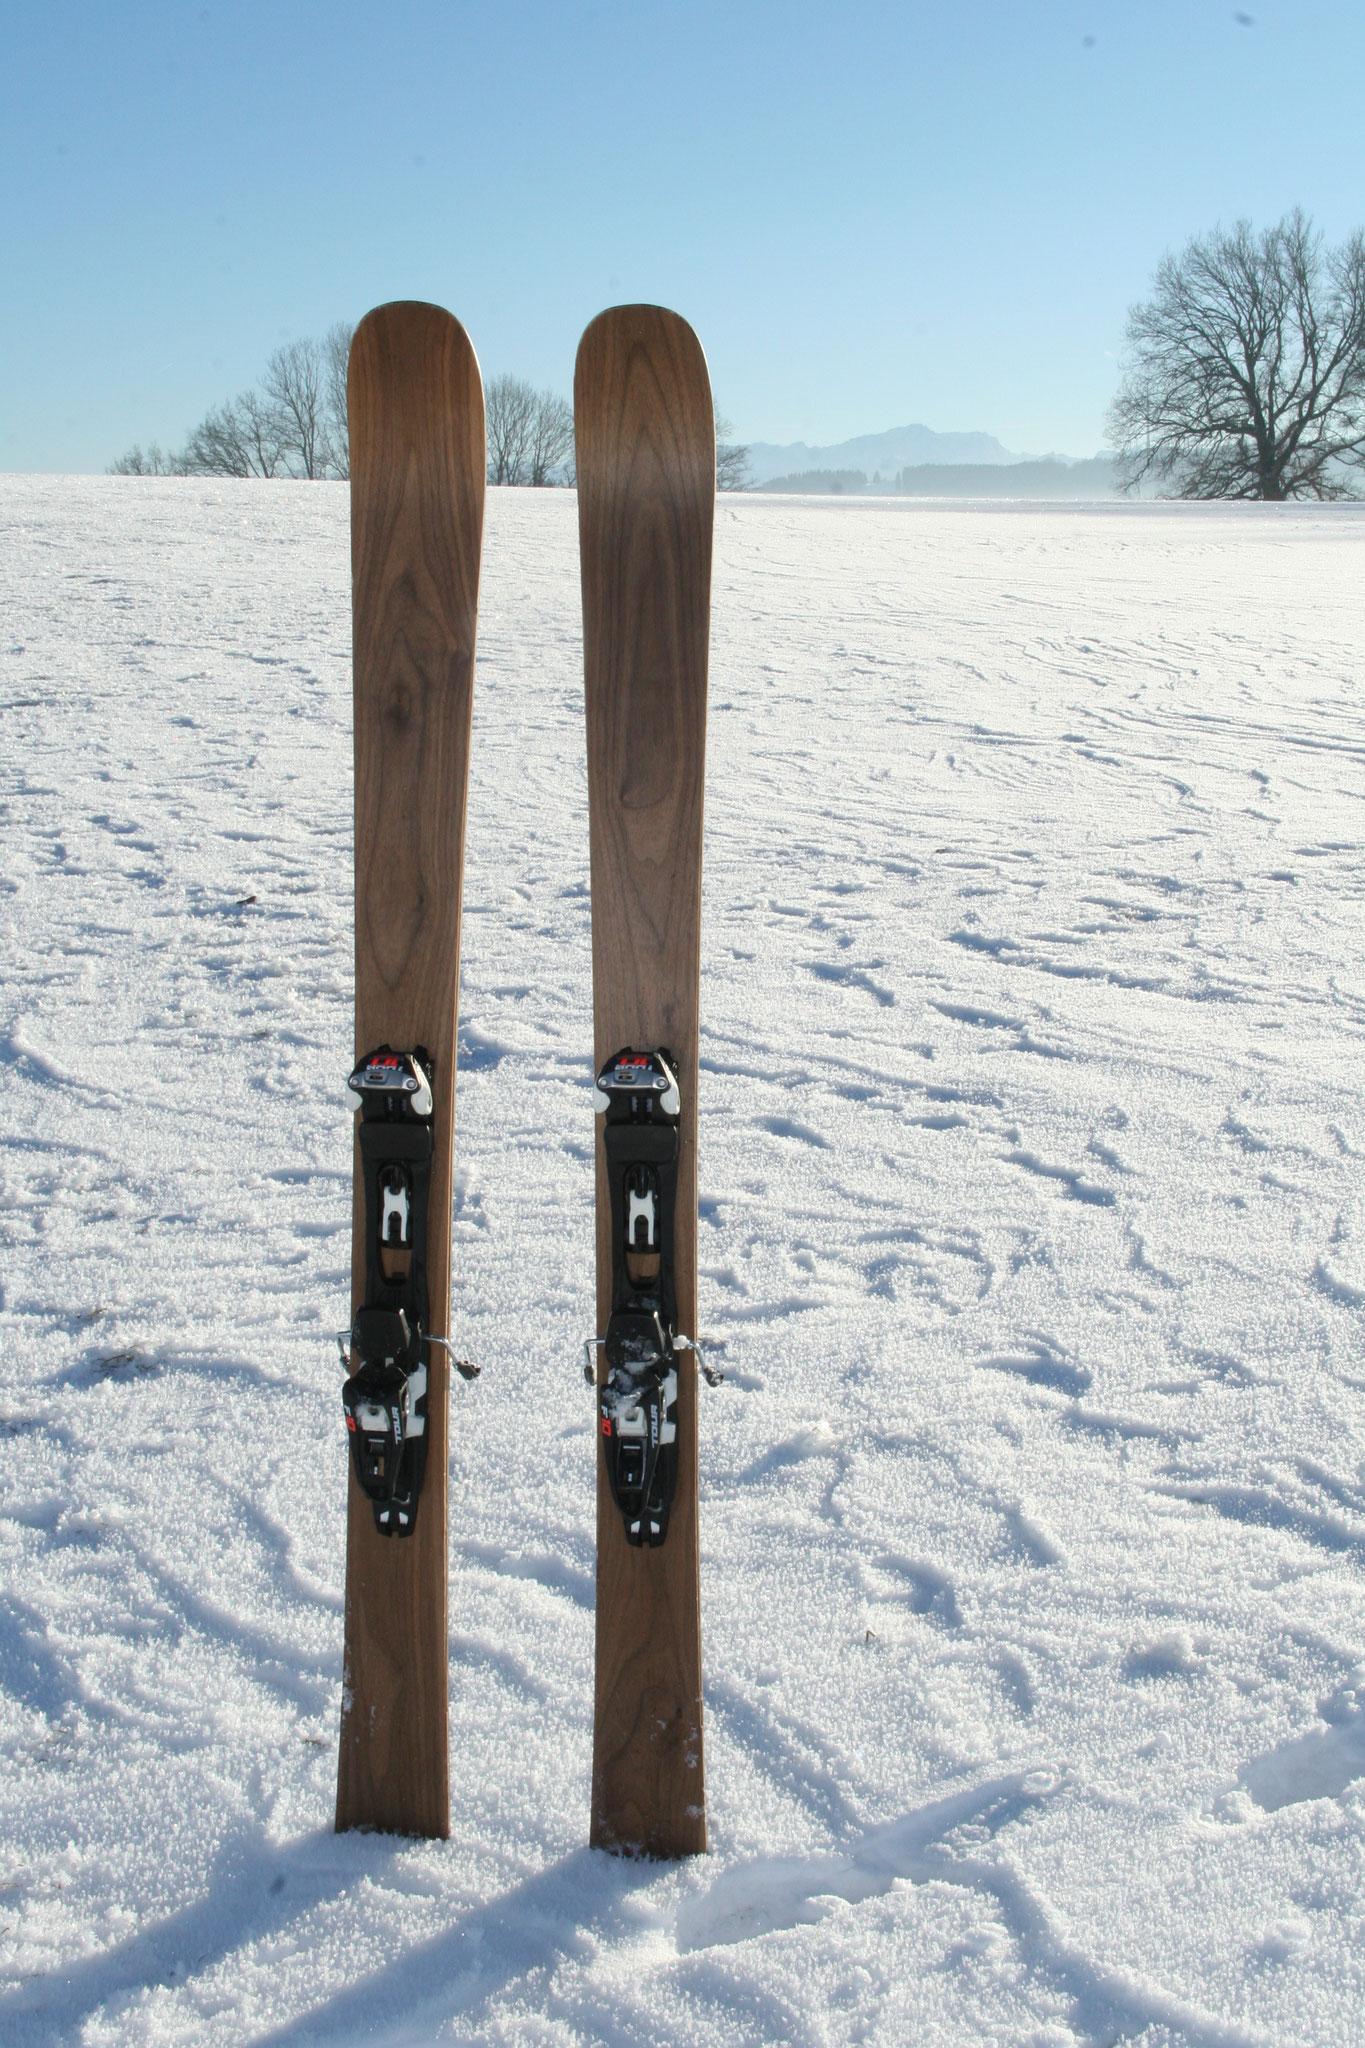 Walnuss: 164 cm Länge, 135 - 107 - 127